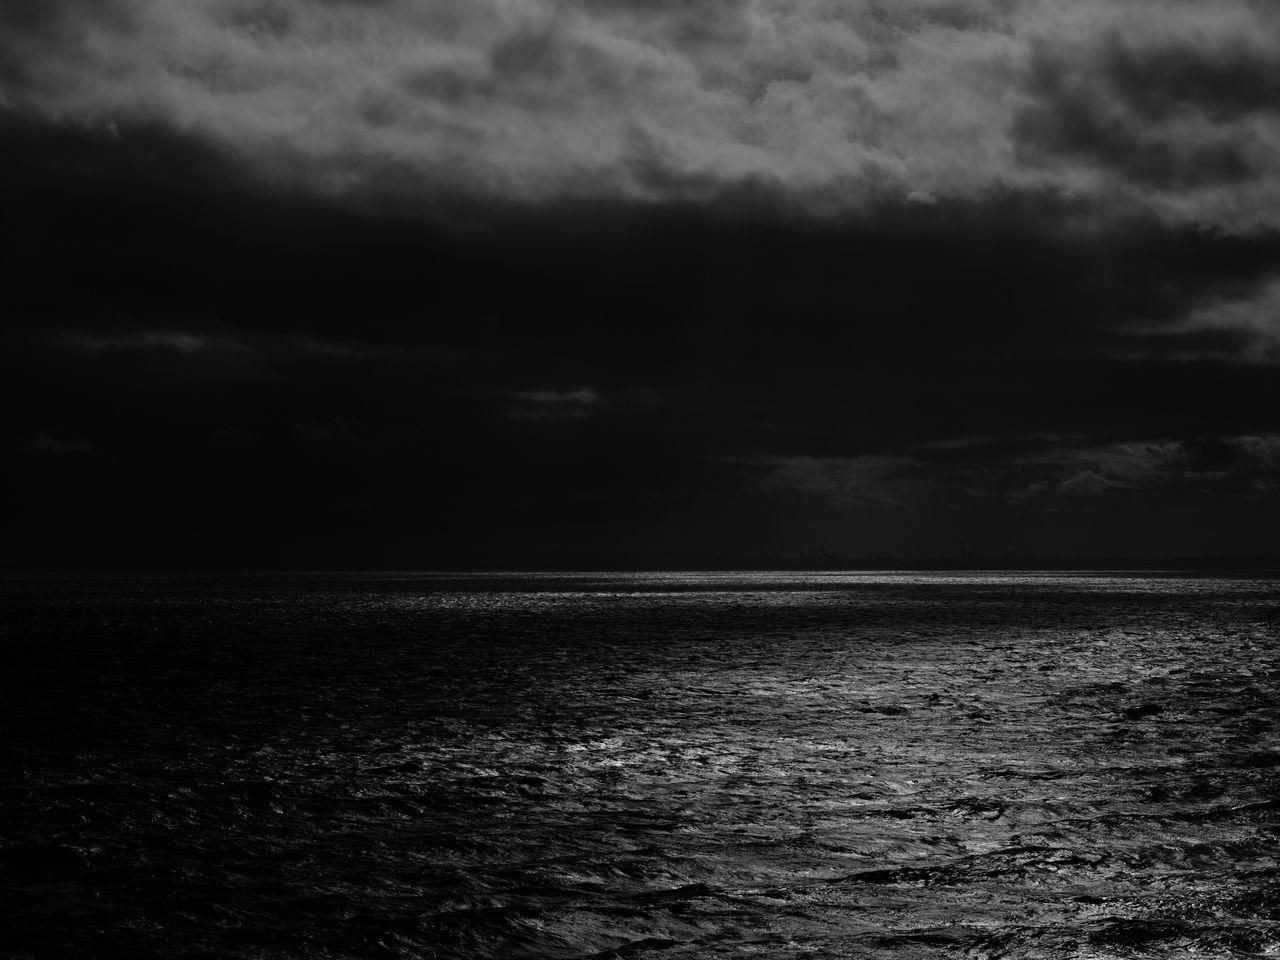 1280x960 Wallpaper sea, horizon, bw, overcast, clouds, ripples